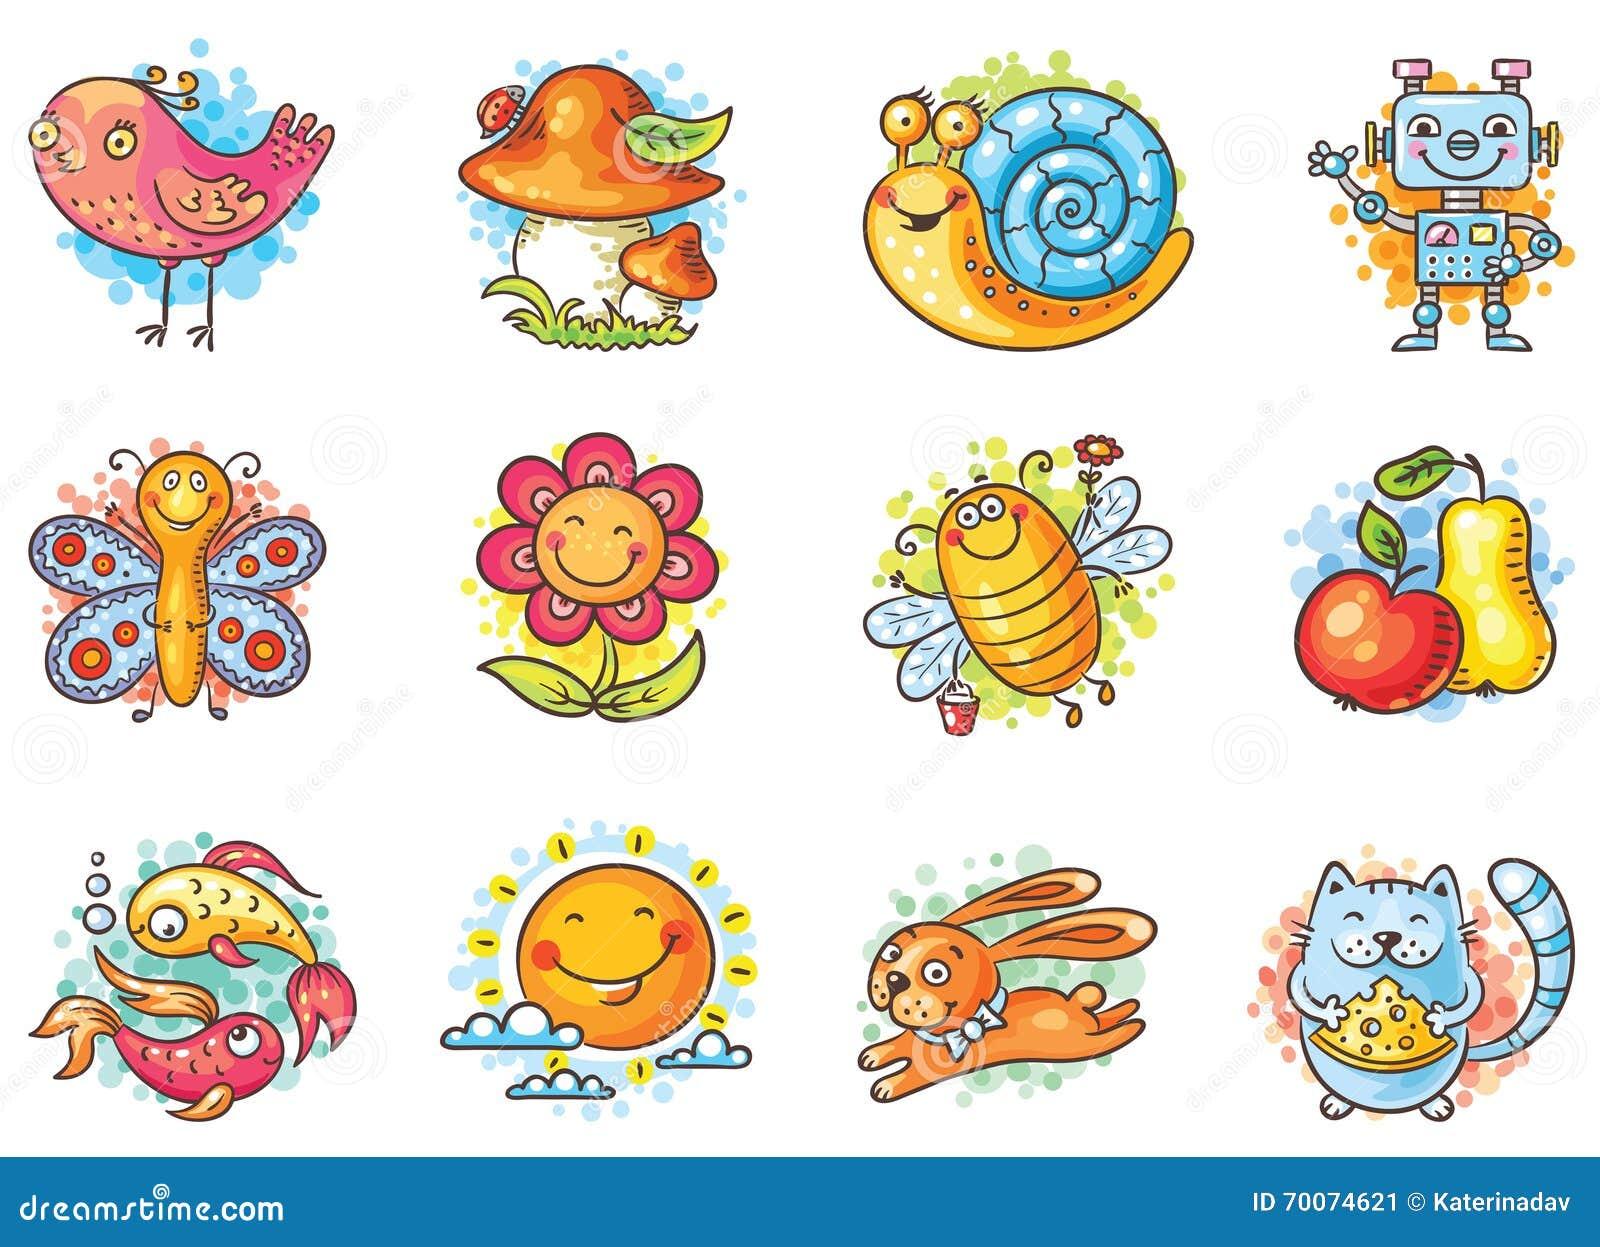 Set Of Cartoon Elements For Kids Designs Stock Vector